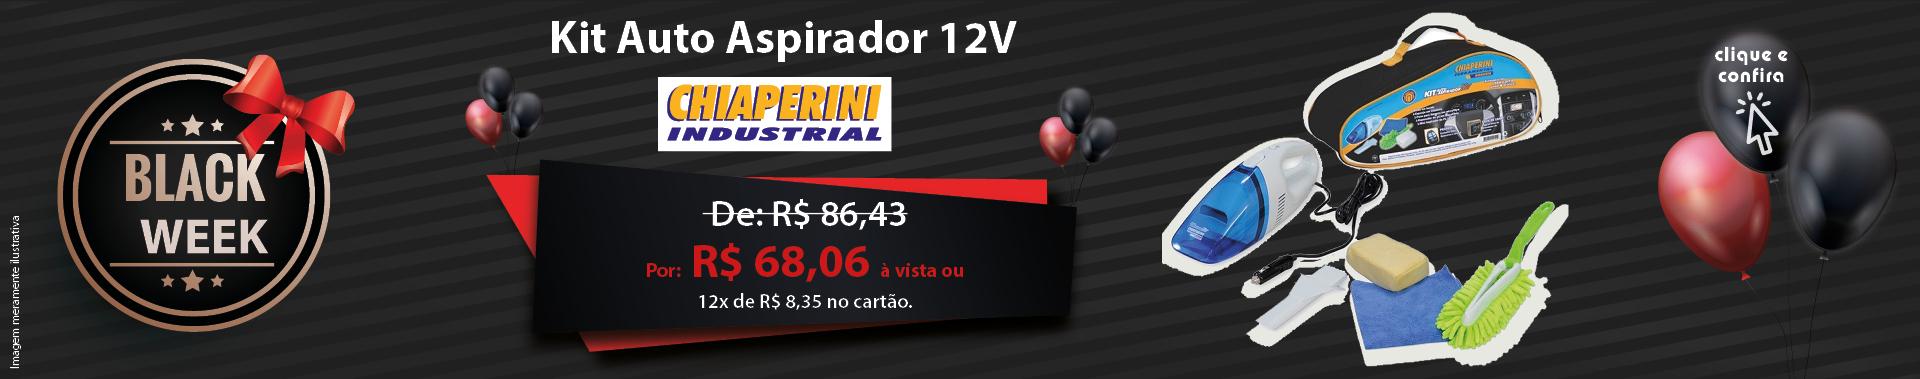 Kit Auto Aspirador 12V - Chiaperini 17142